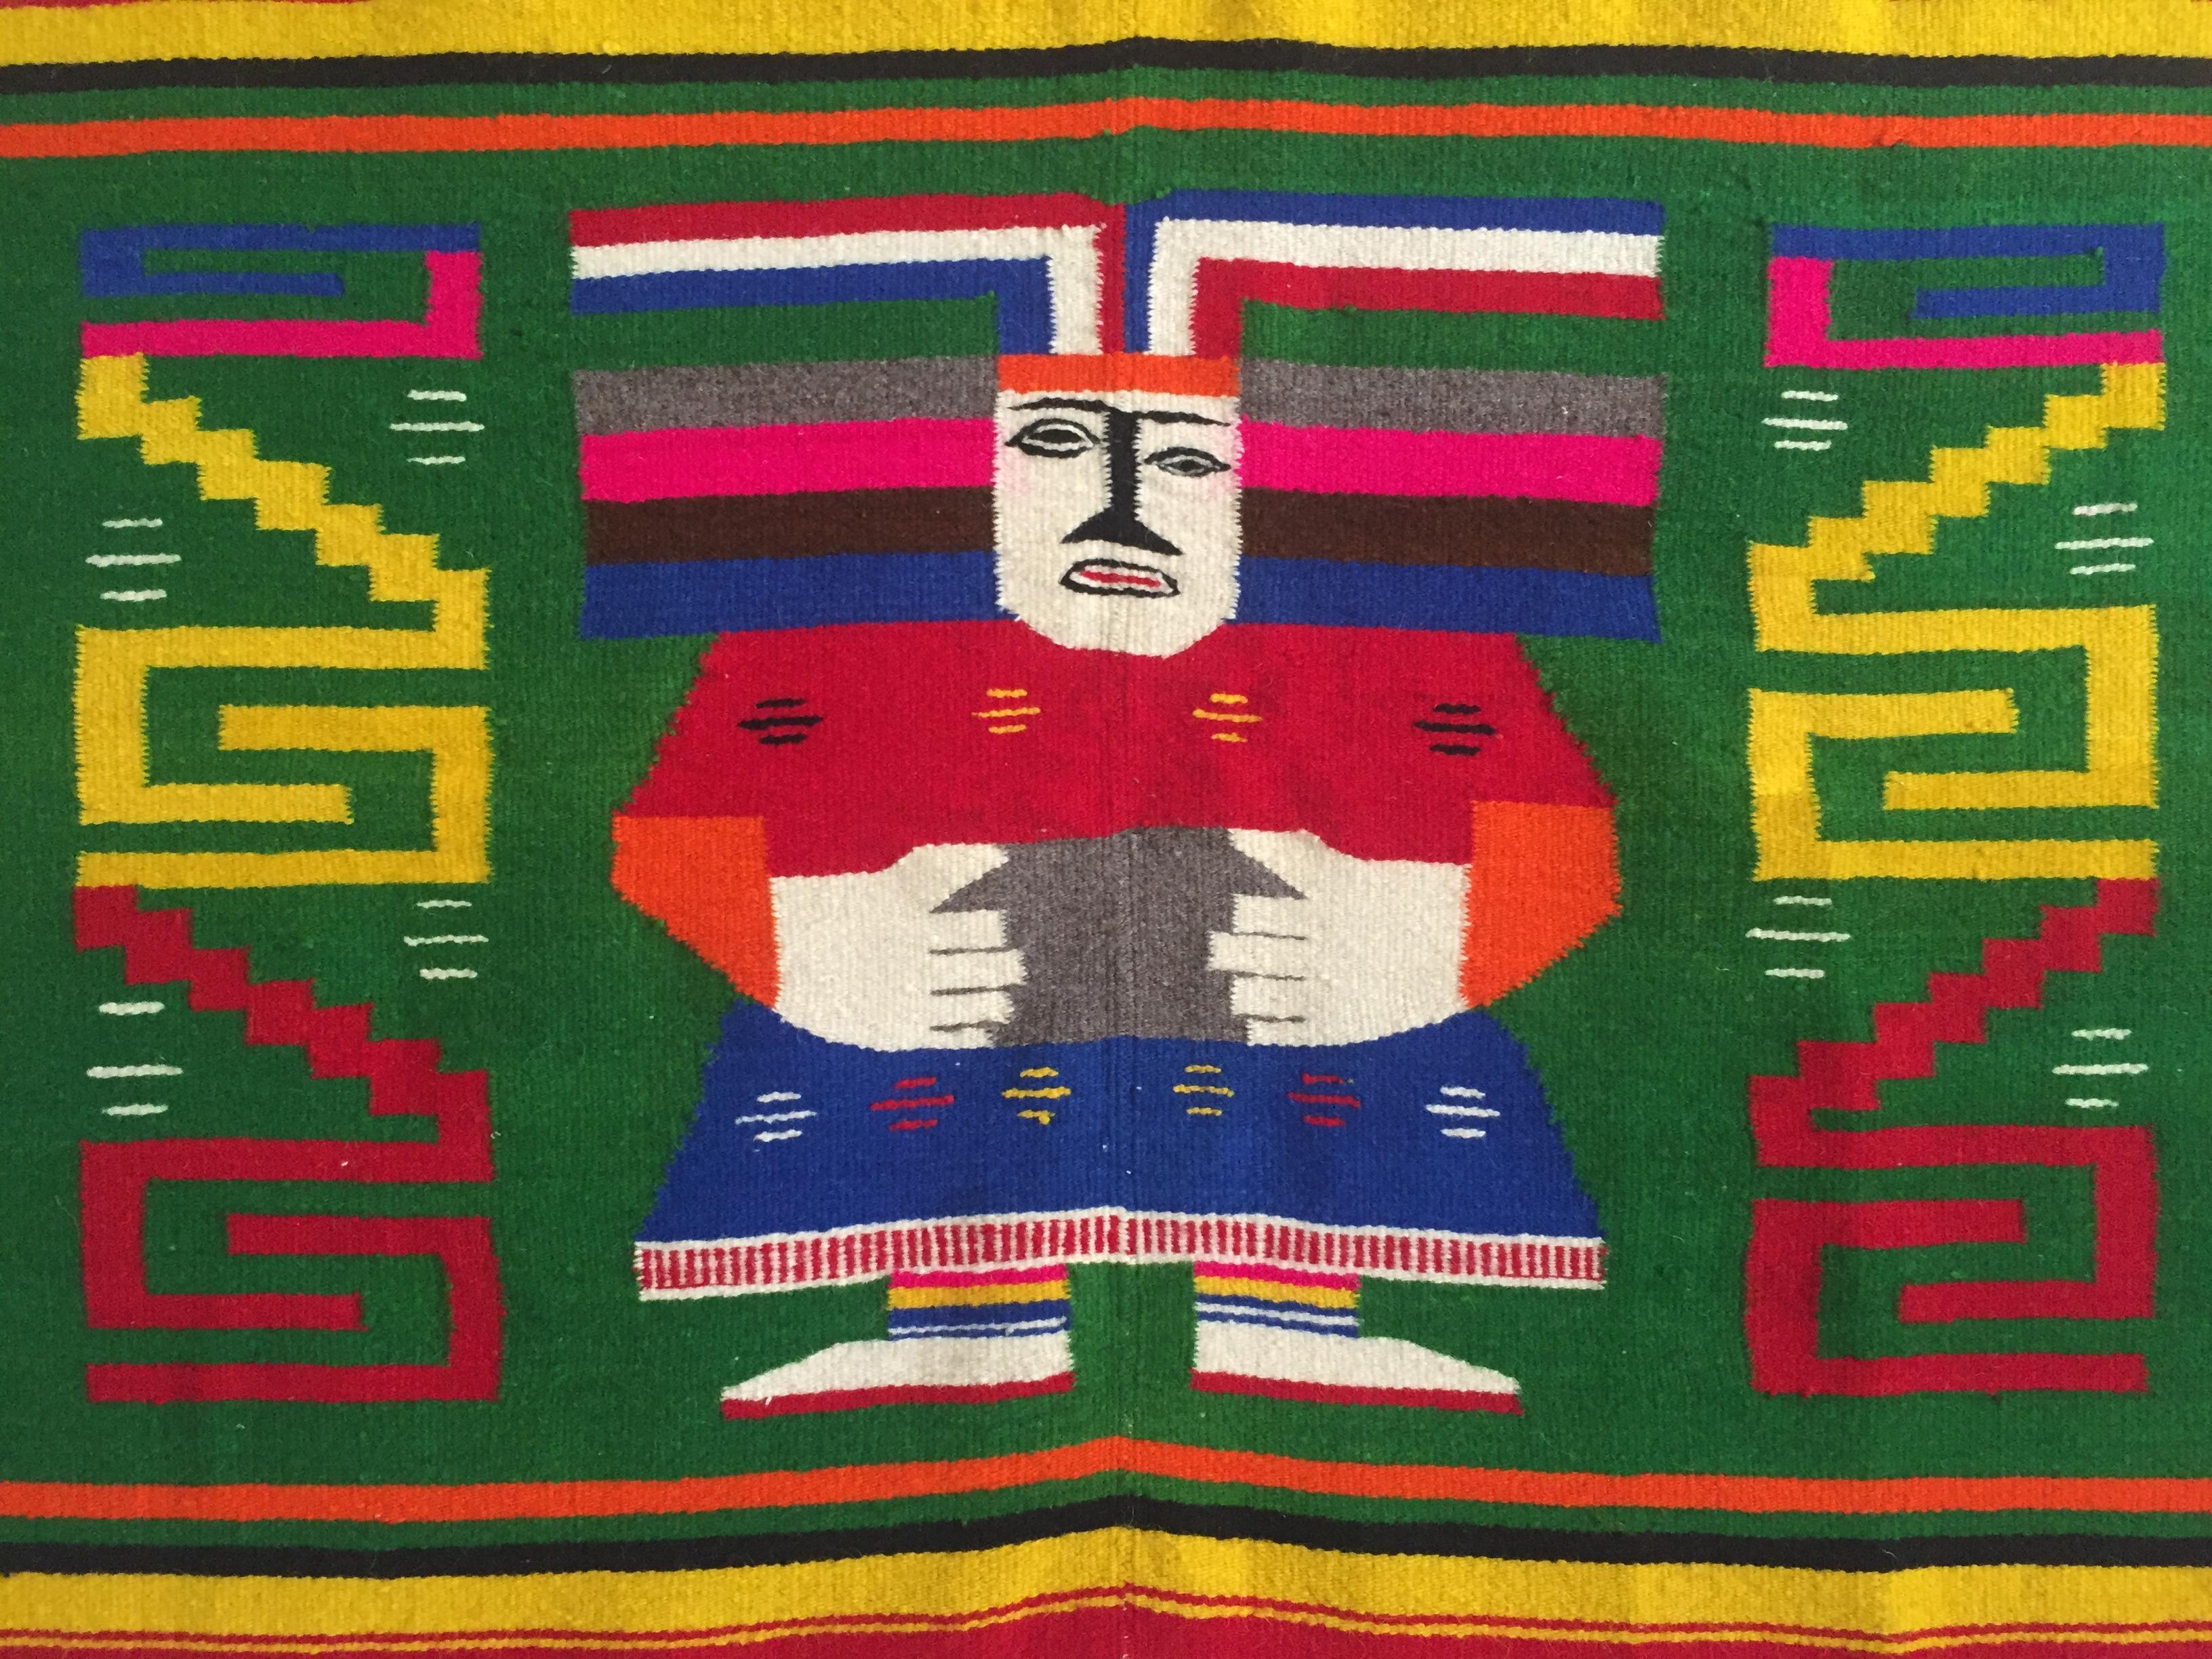 Vintage 1960 S Hand Woven Mayan Zapotec Mexico Wool Blanket Chairish